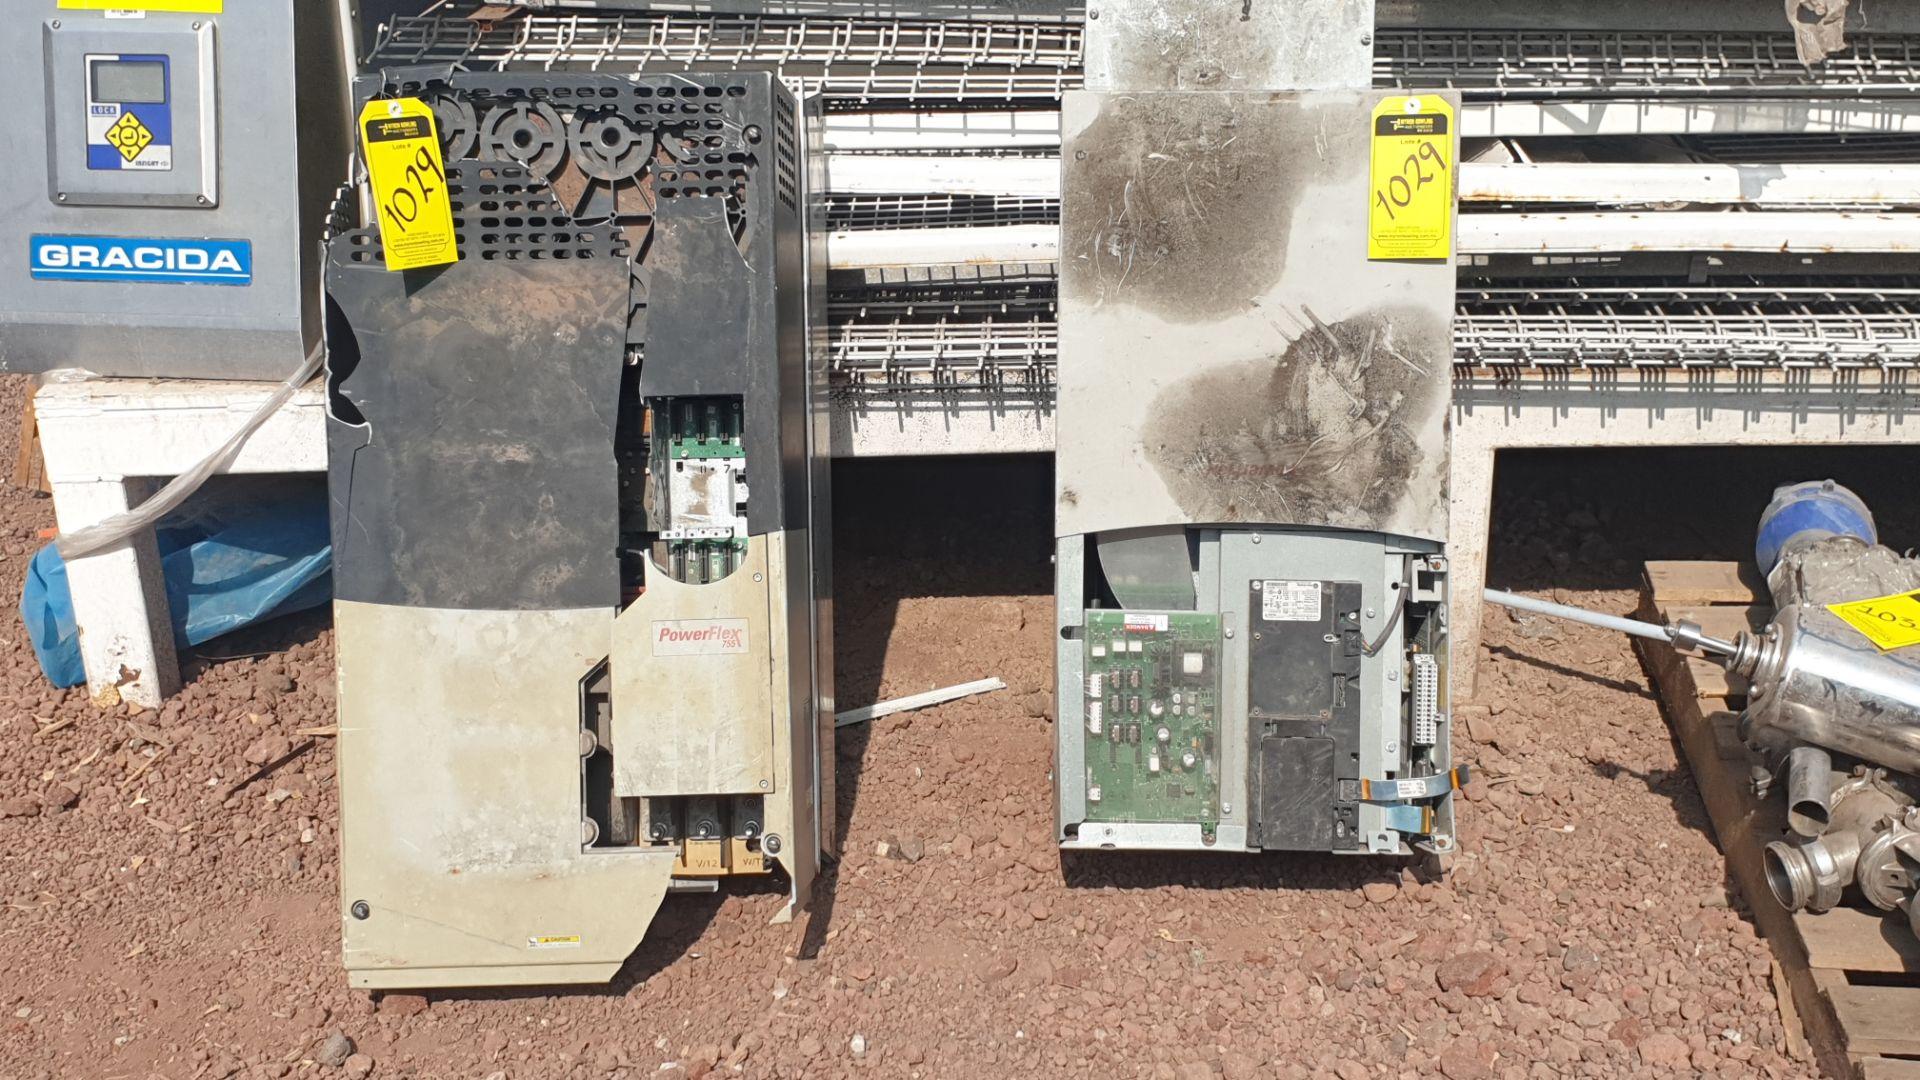 2 Powerflex Variator boards, model 20G1AN, 20BD180A0AYNANC0 - Image 7 of 13